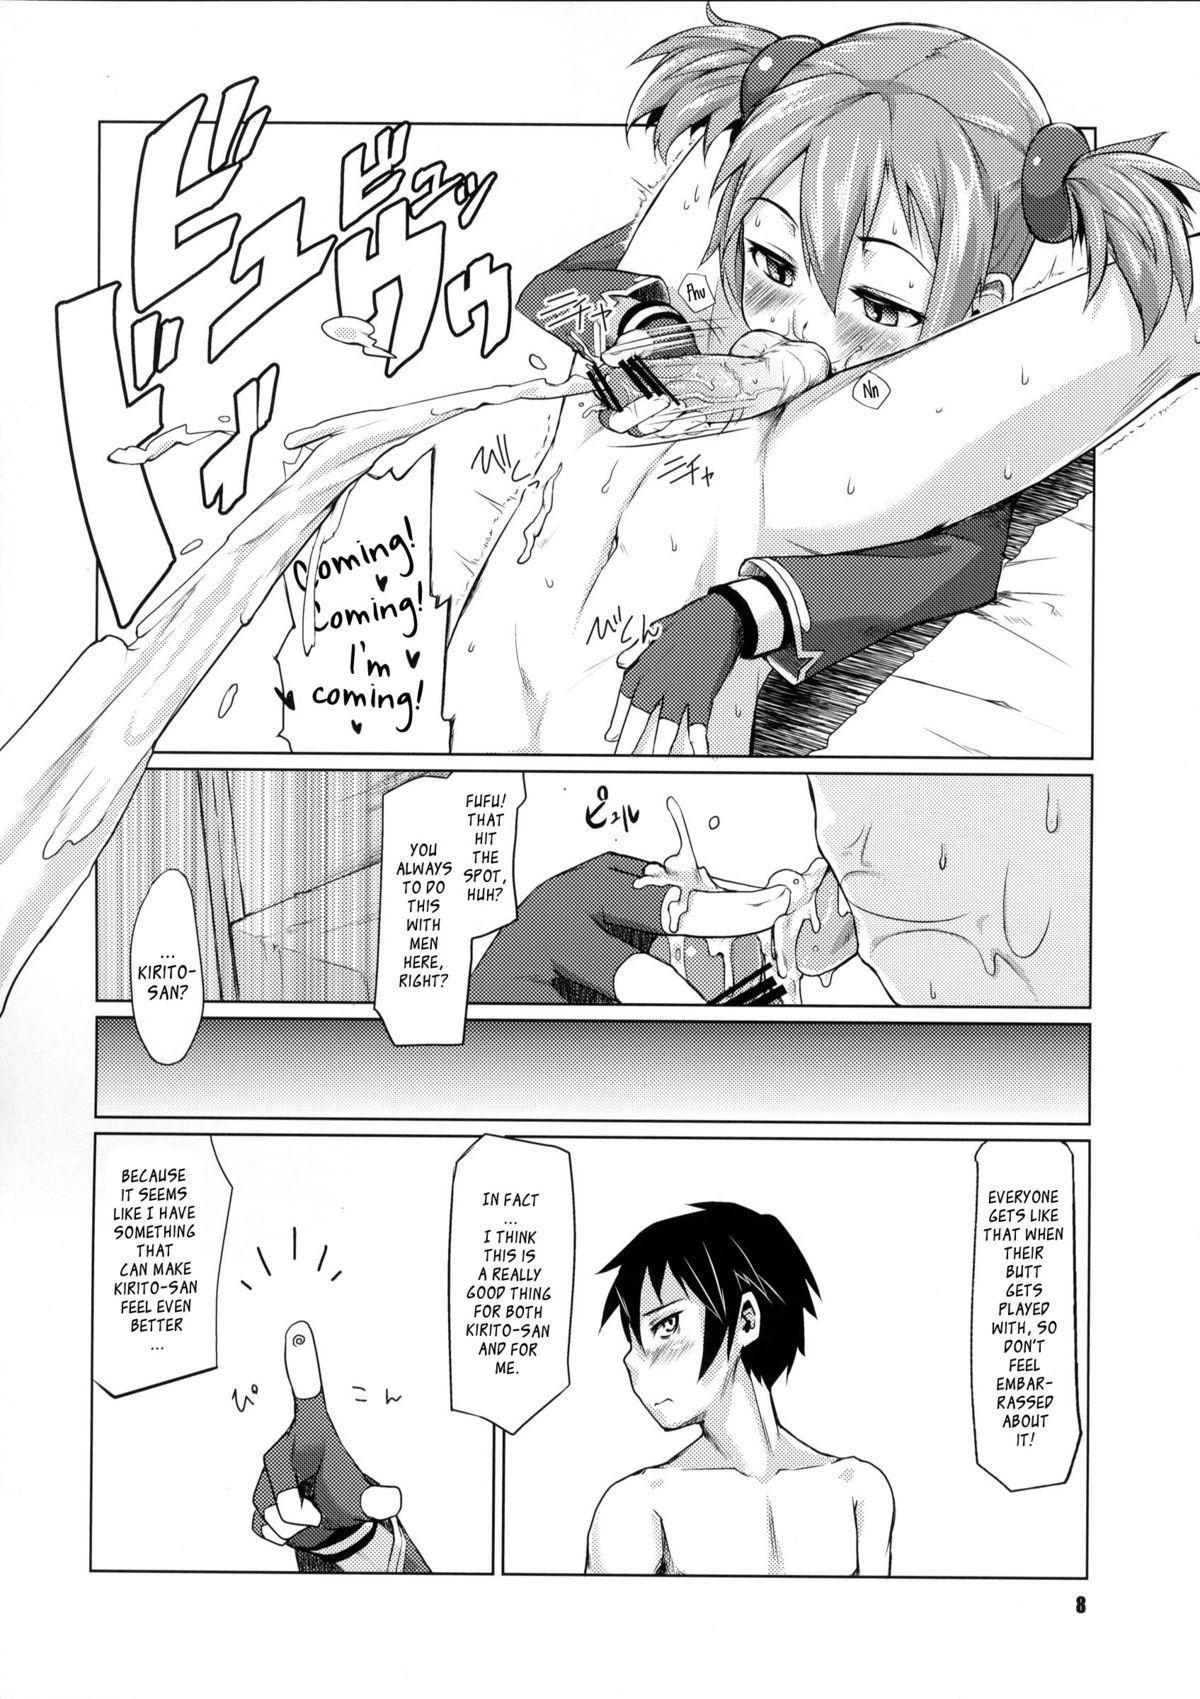 (C83) [Shichimen Soka (Sexyturkey)] Silica-chan ni Oshiri Ijirareru Hon | Silica-chan Playing With Your Butt Book (Sword Art Online) [English] 6